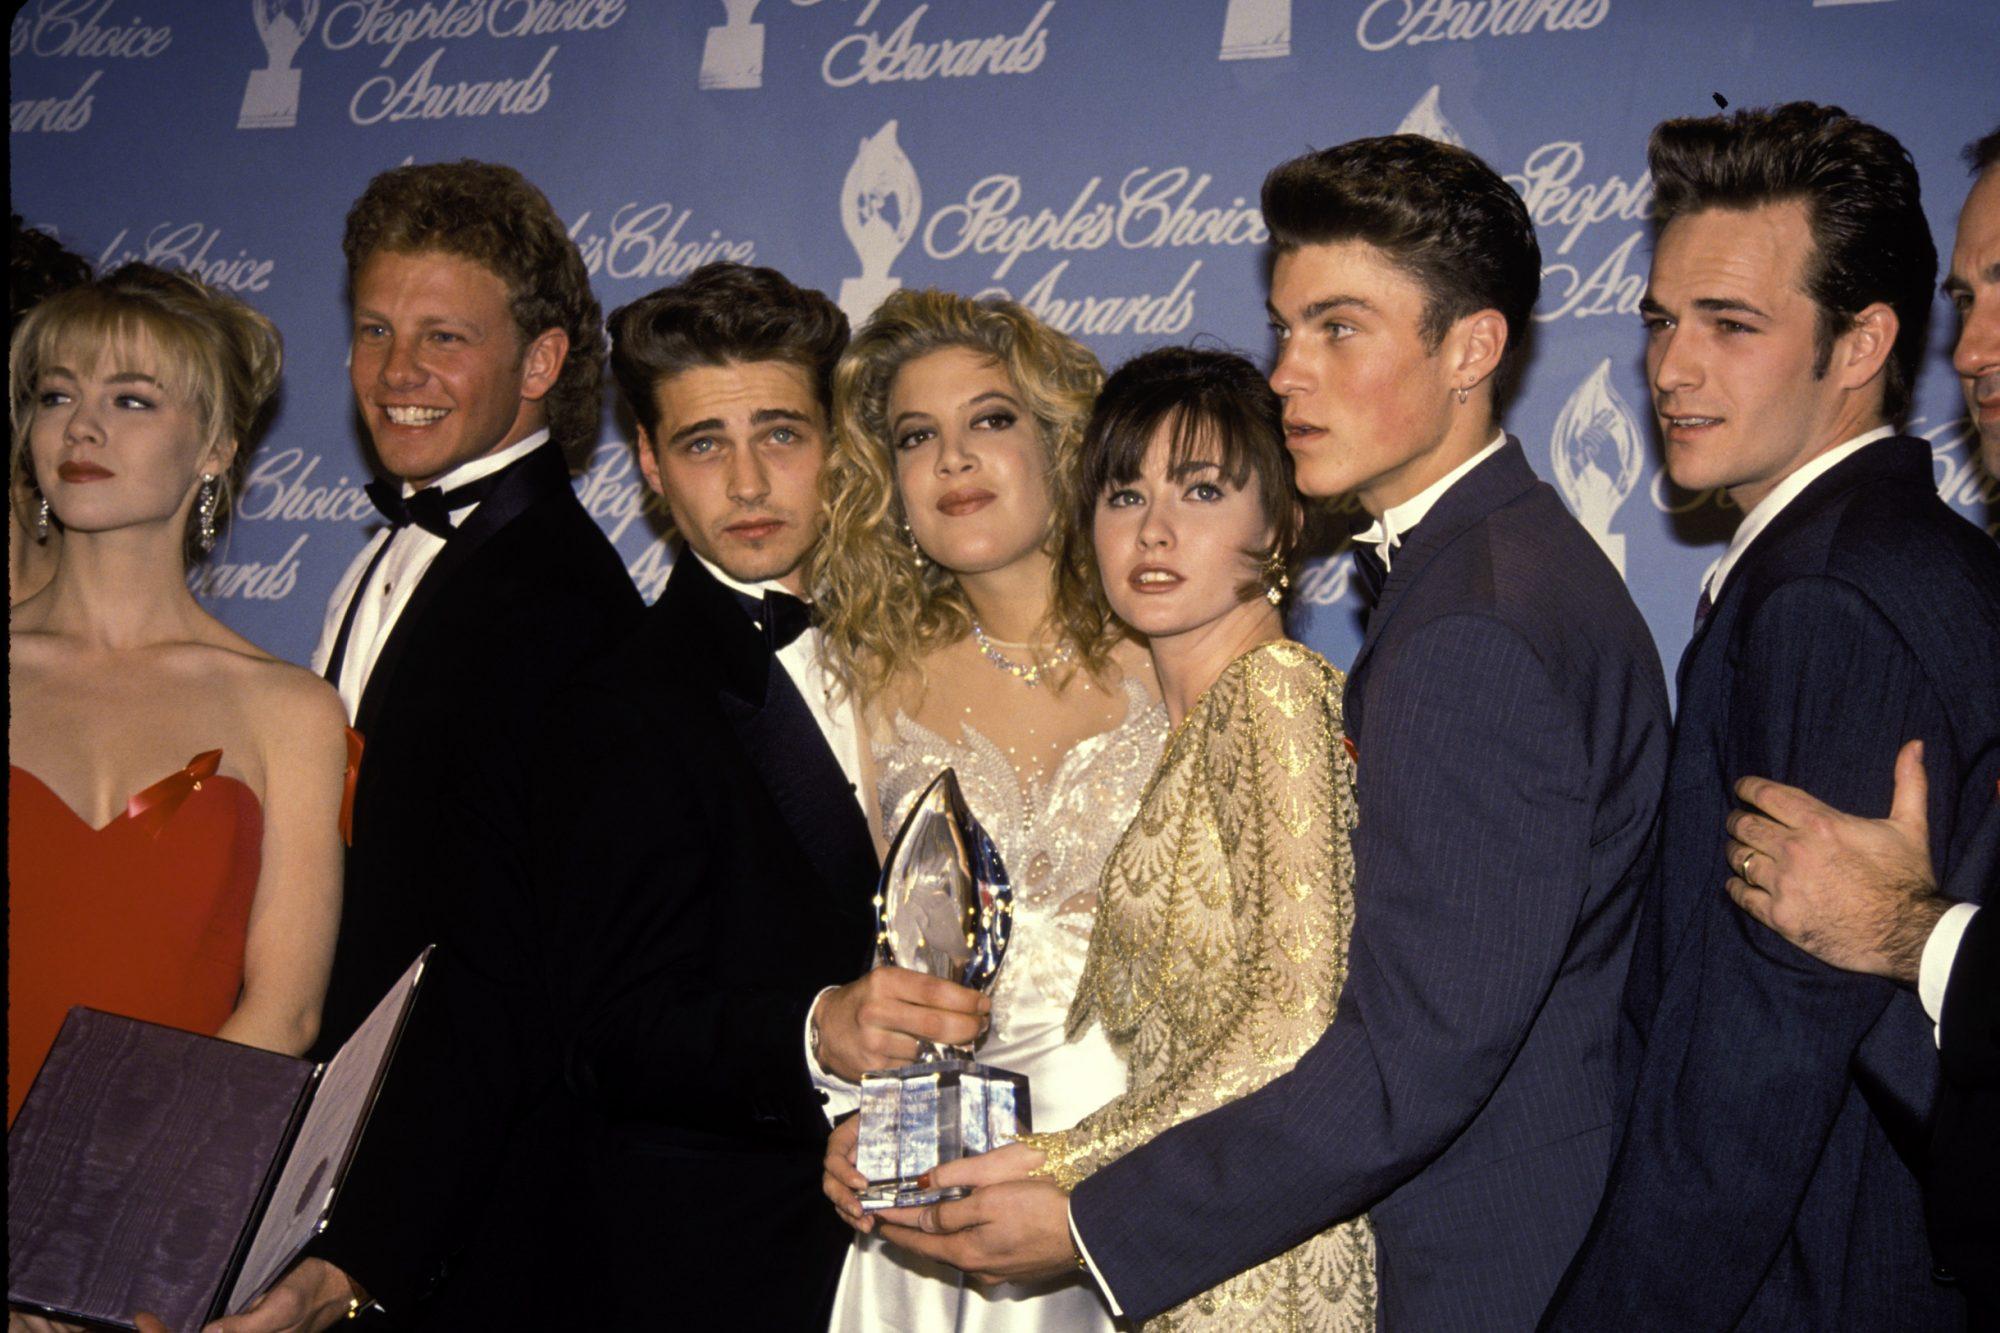 1992, hairspray's glorious heyday